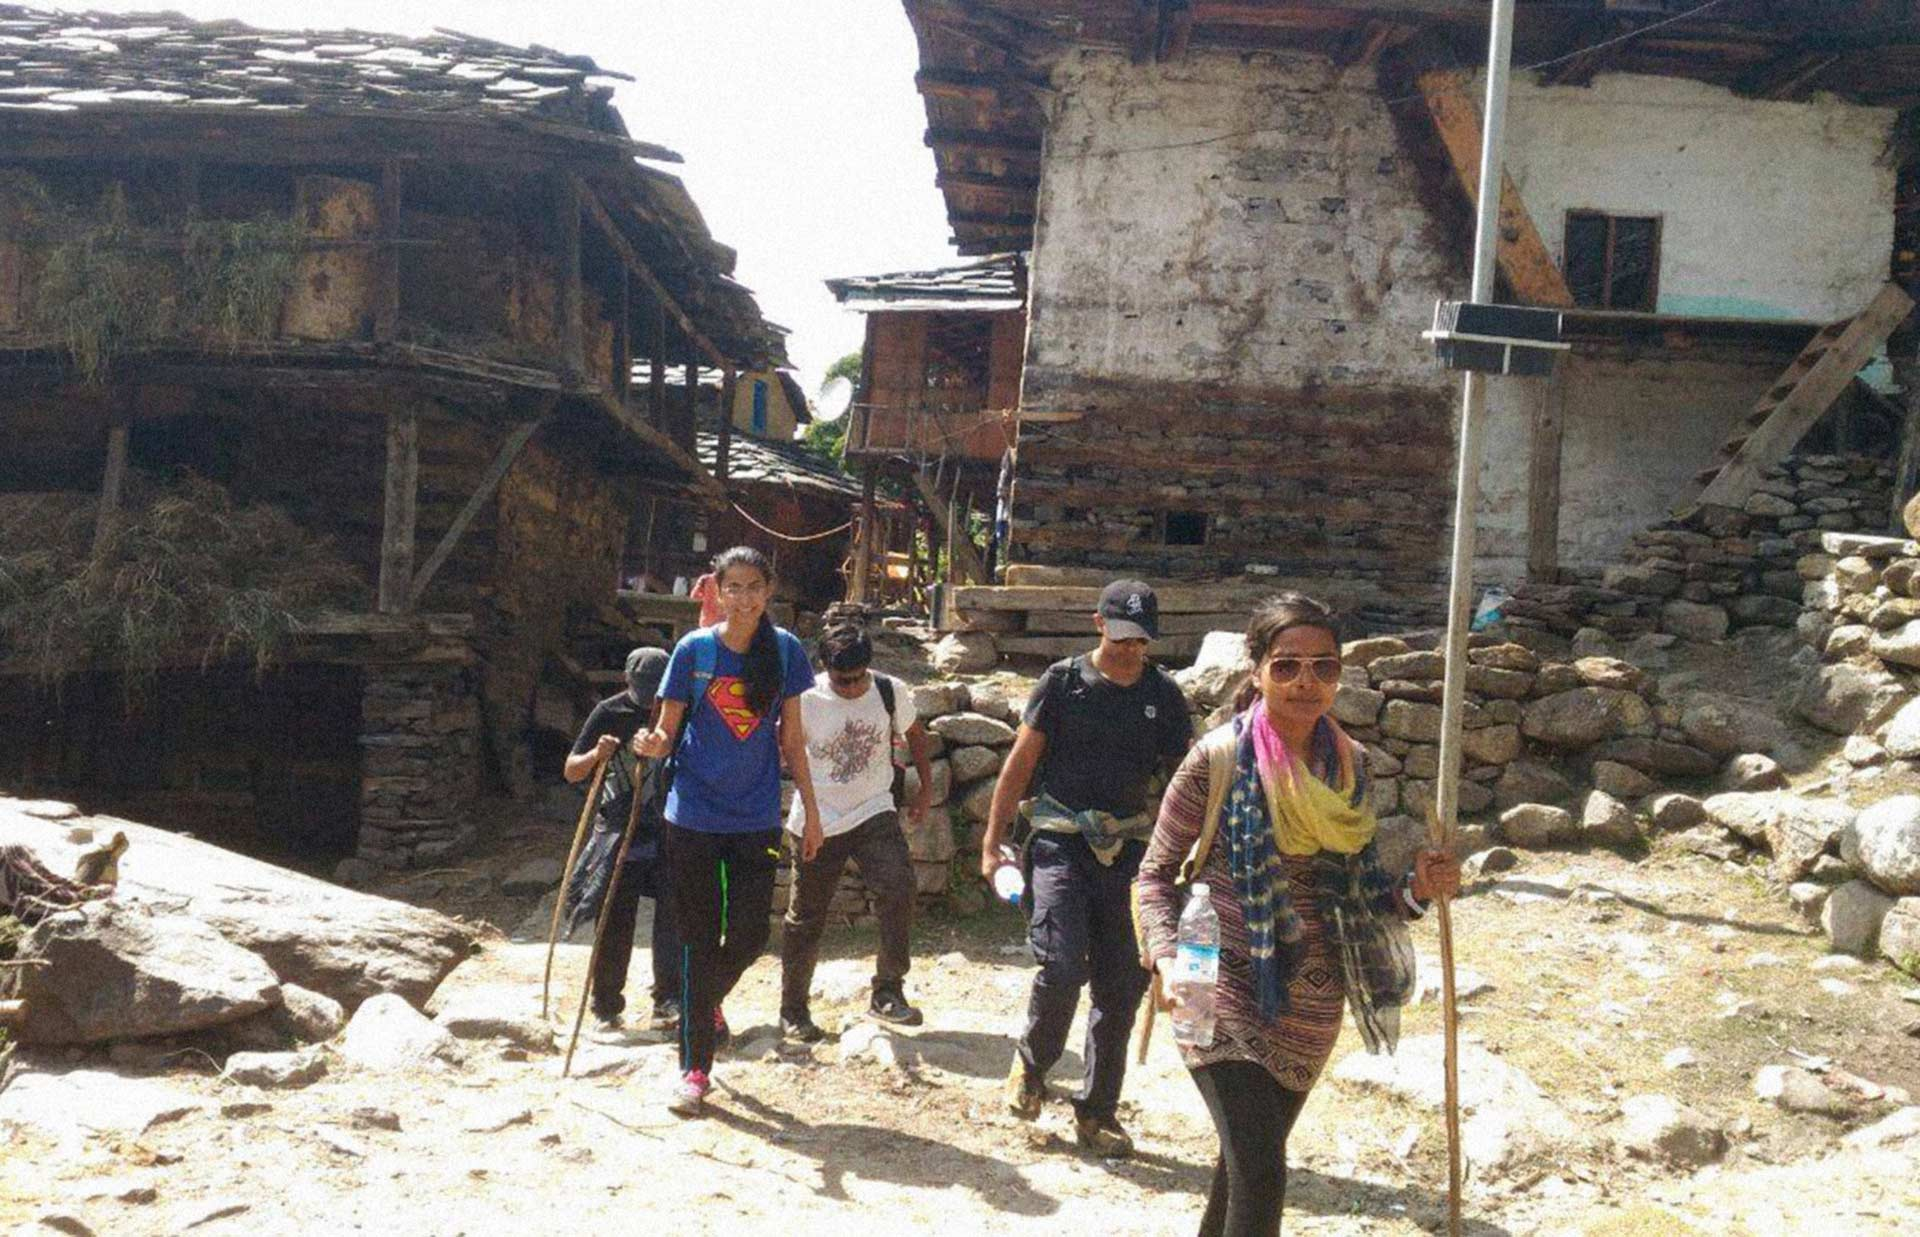 http://m.thegreatnext.com/Himalayan Budget Trekking Adventure Trekking Himachal Kheerganga Parvati Valley